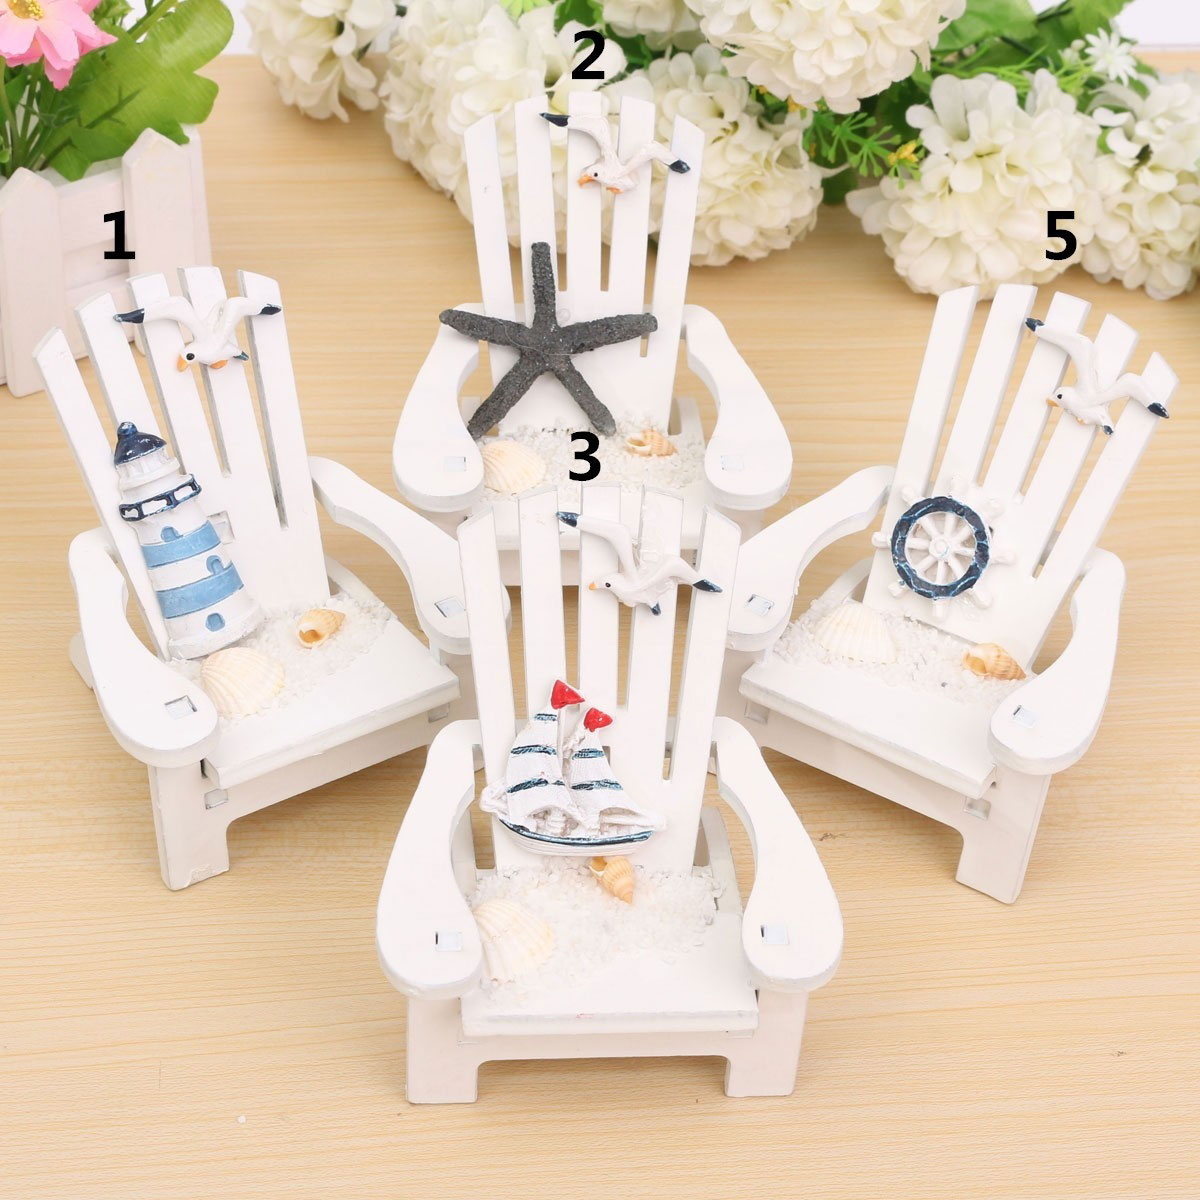 White wooden beach chair - 2016 Mini Wood Beach Chair Nautical Ornaments Mediterranean Style For Home Decoration Fp China